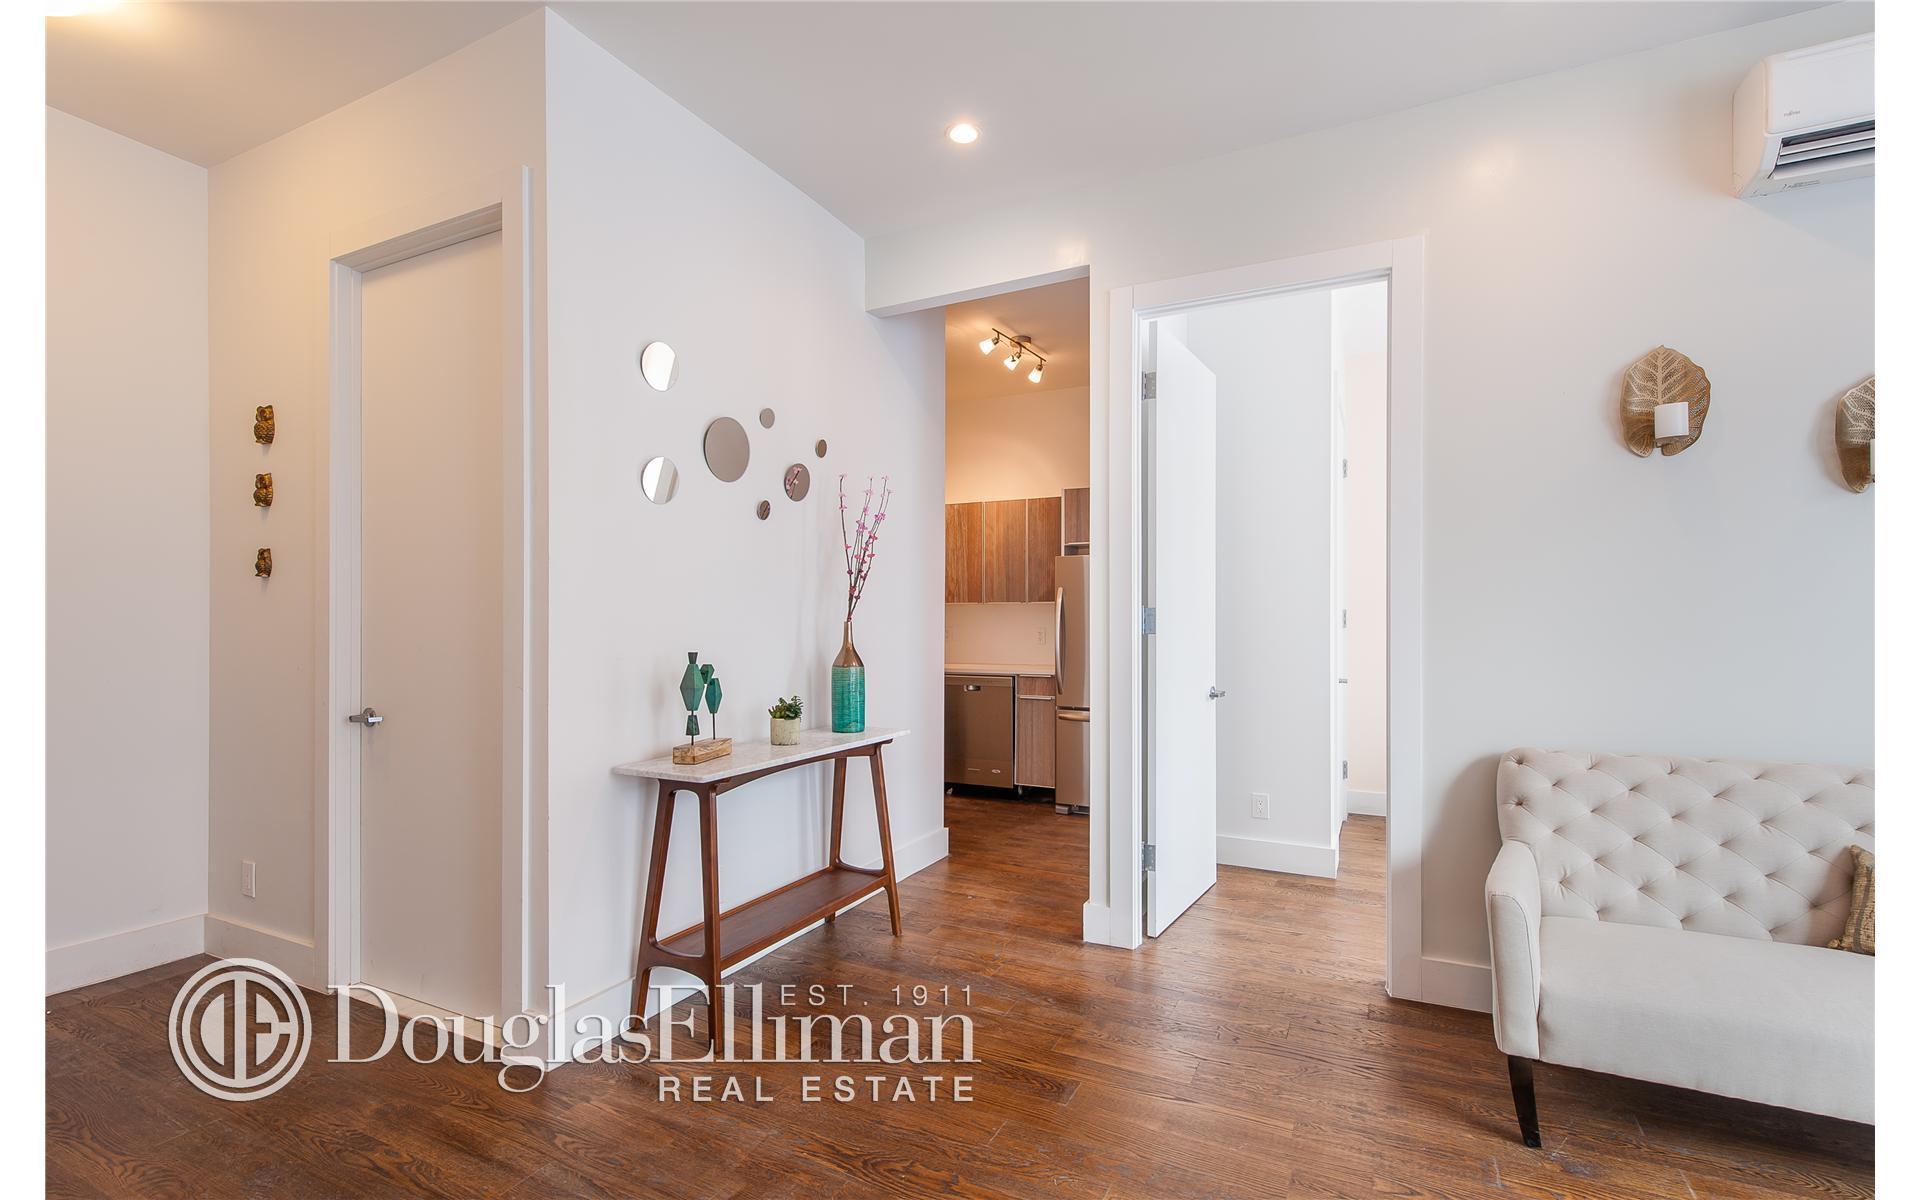 655 Franklin Ave #2R, Brooklyn, NY 11238 - Recently Sold | Trulia